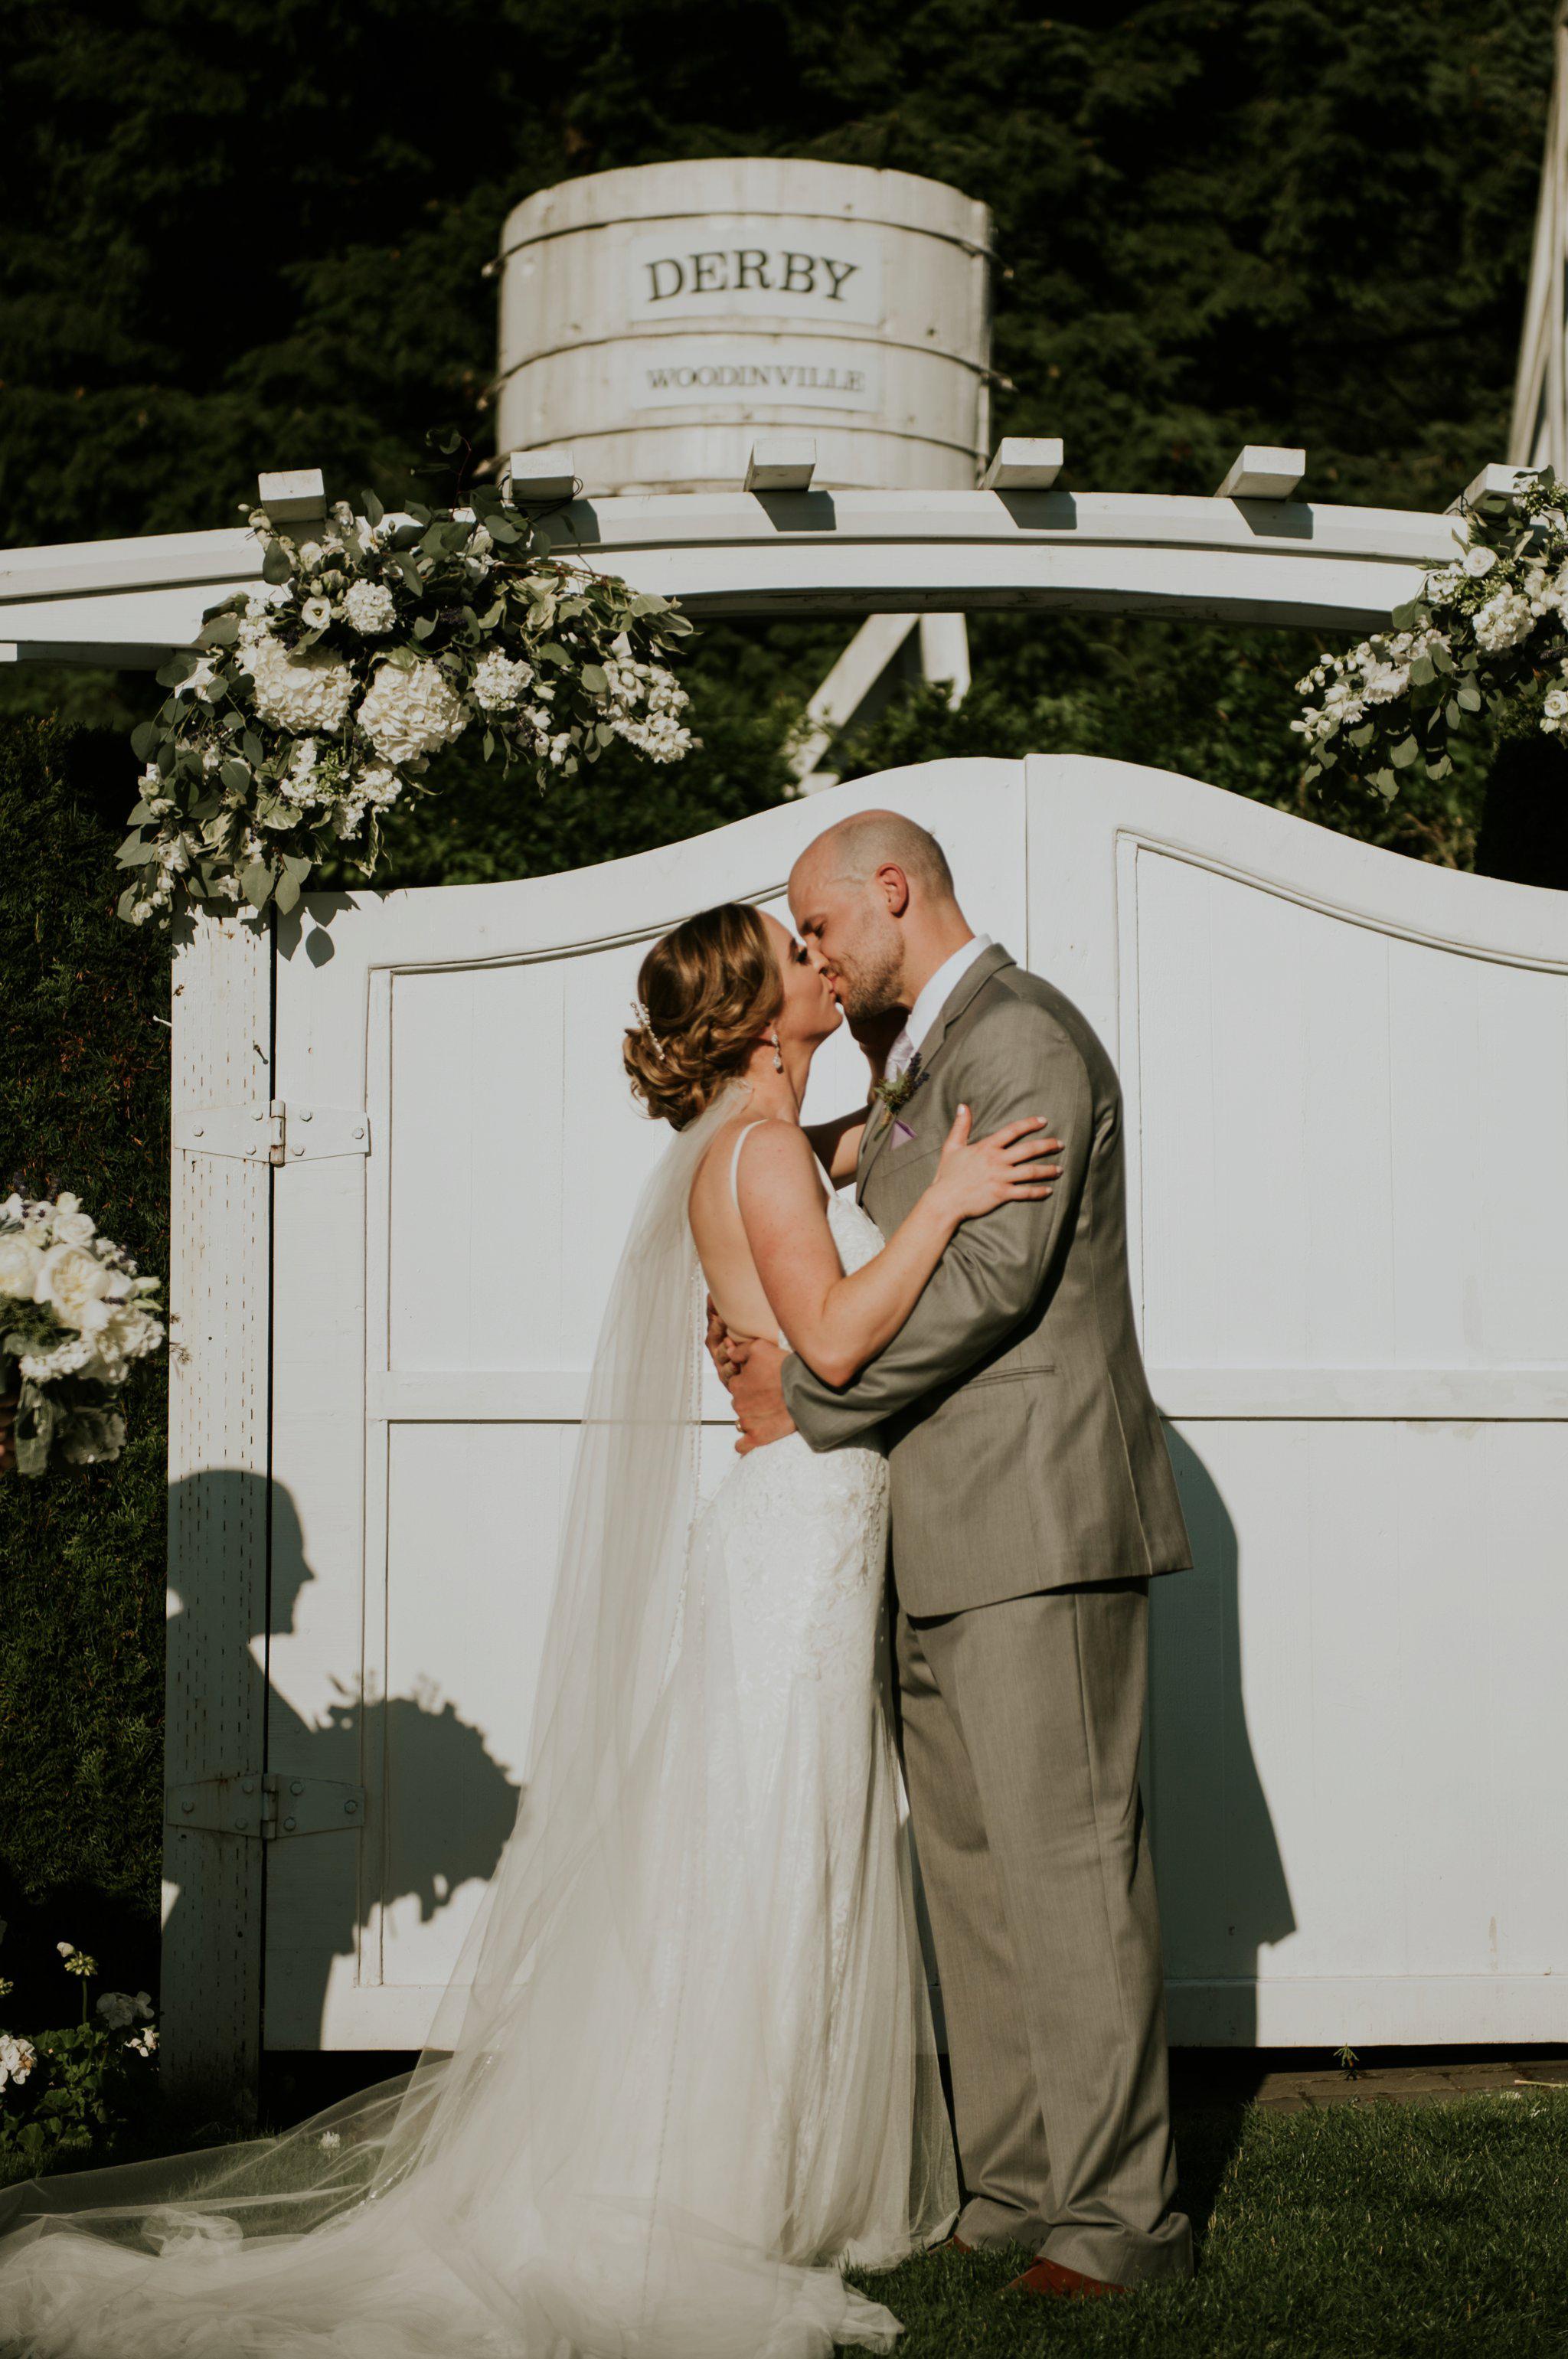 hollywood-school-house-wedding-seattle-photographer-caitlyn-nikula-80.jpg